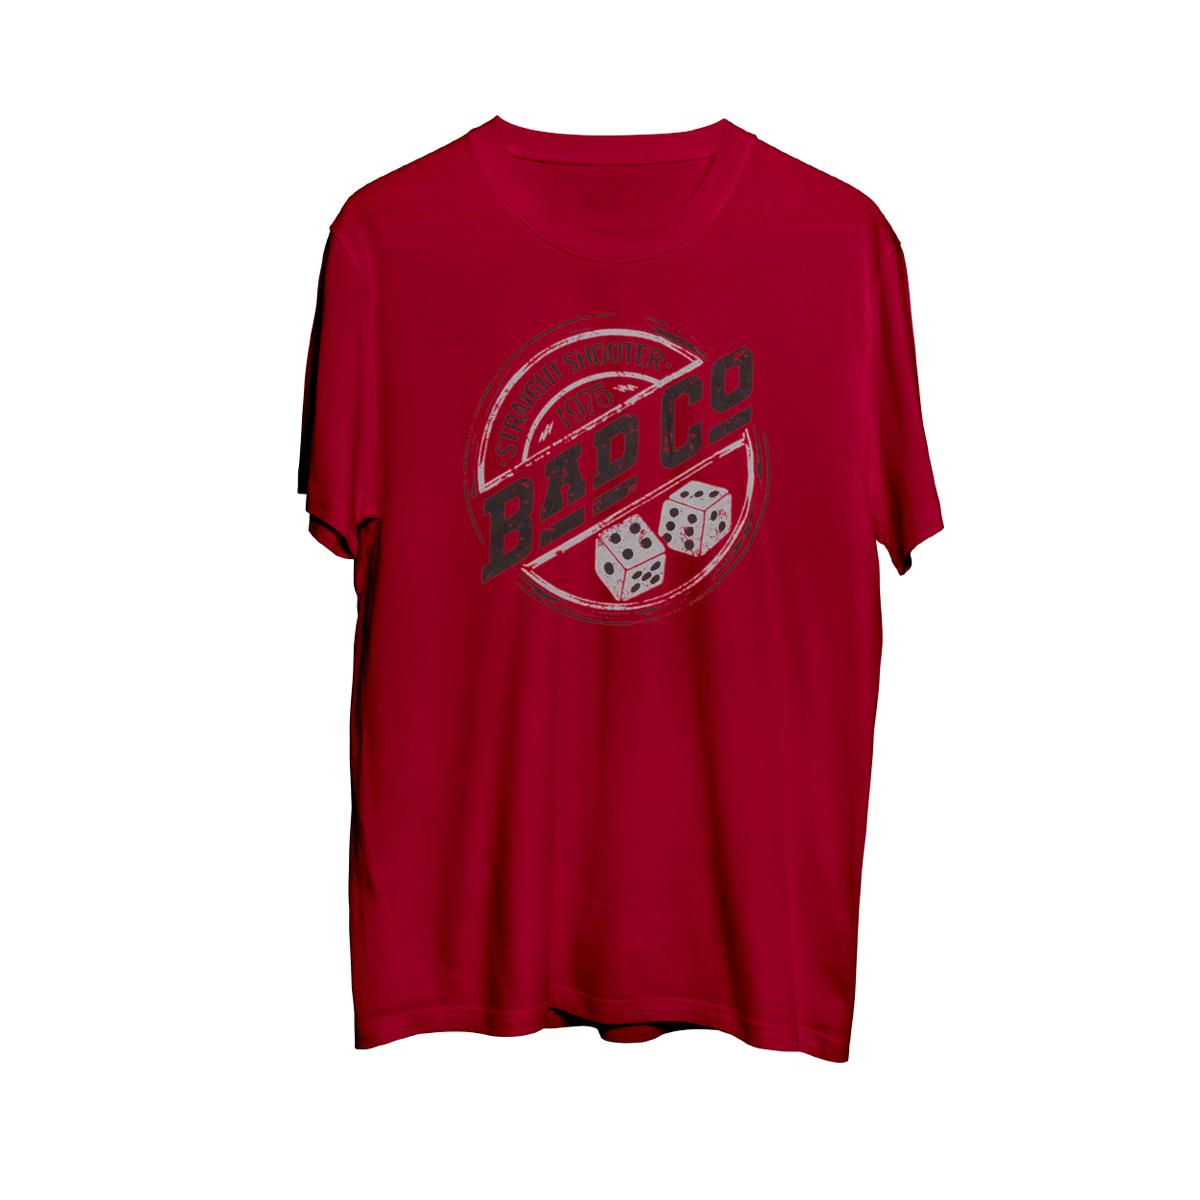 Straight Shooter Dice T-shirt